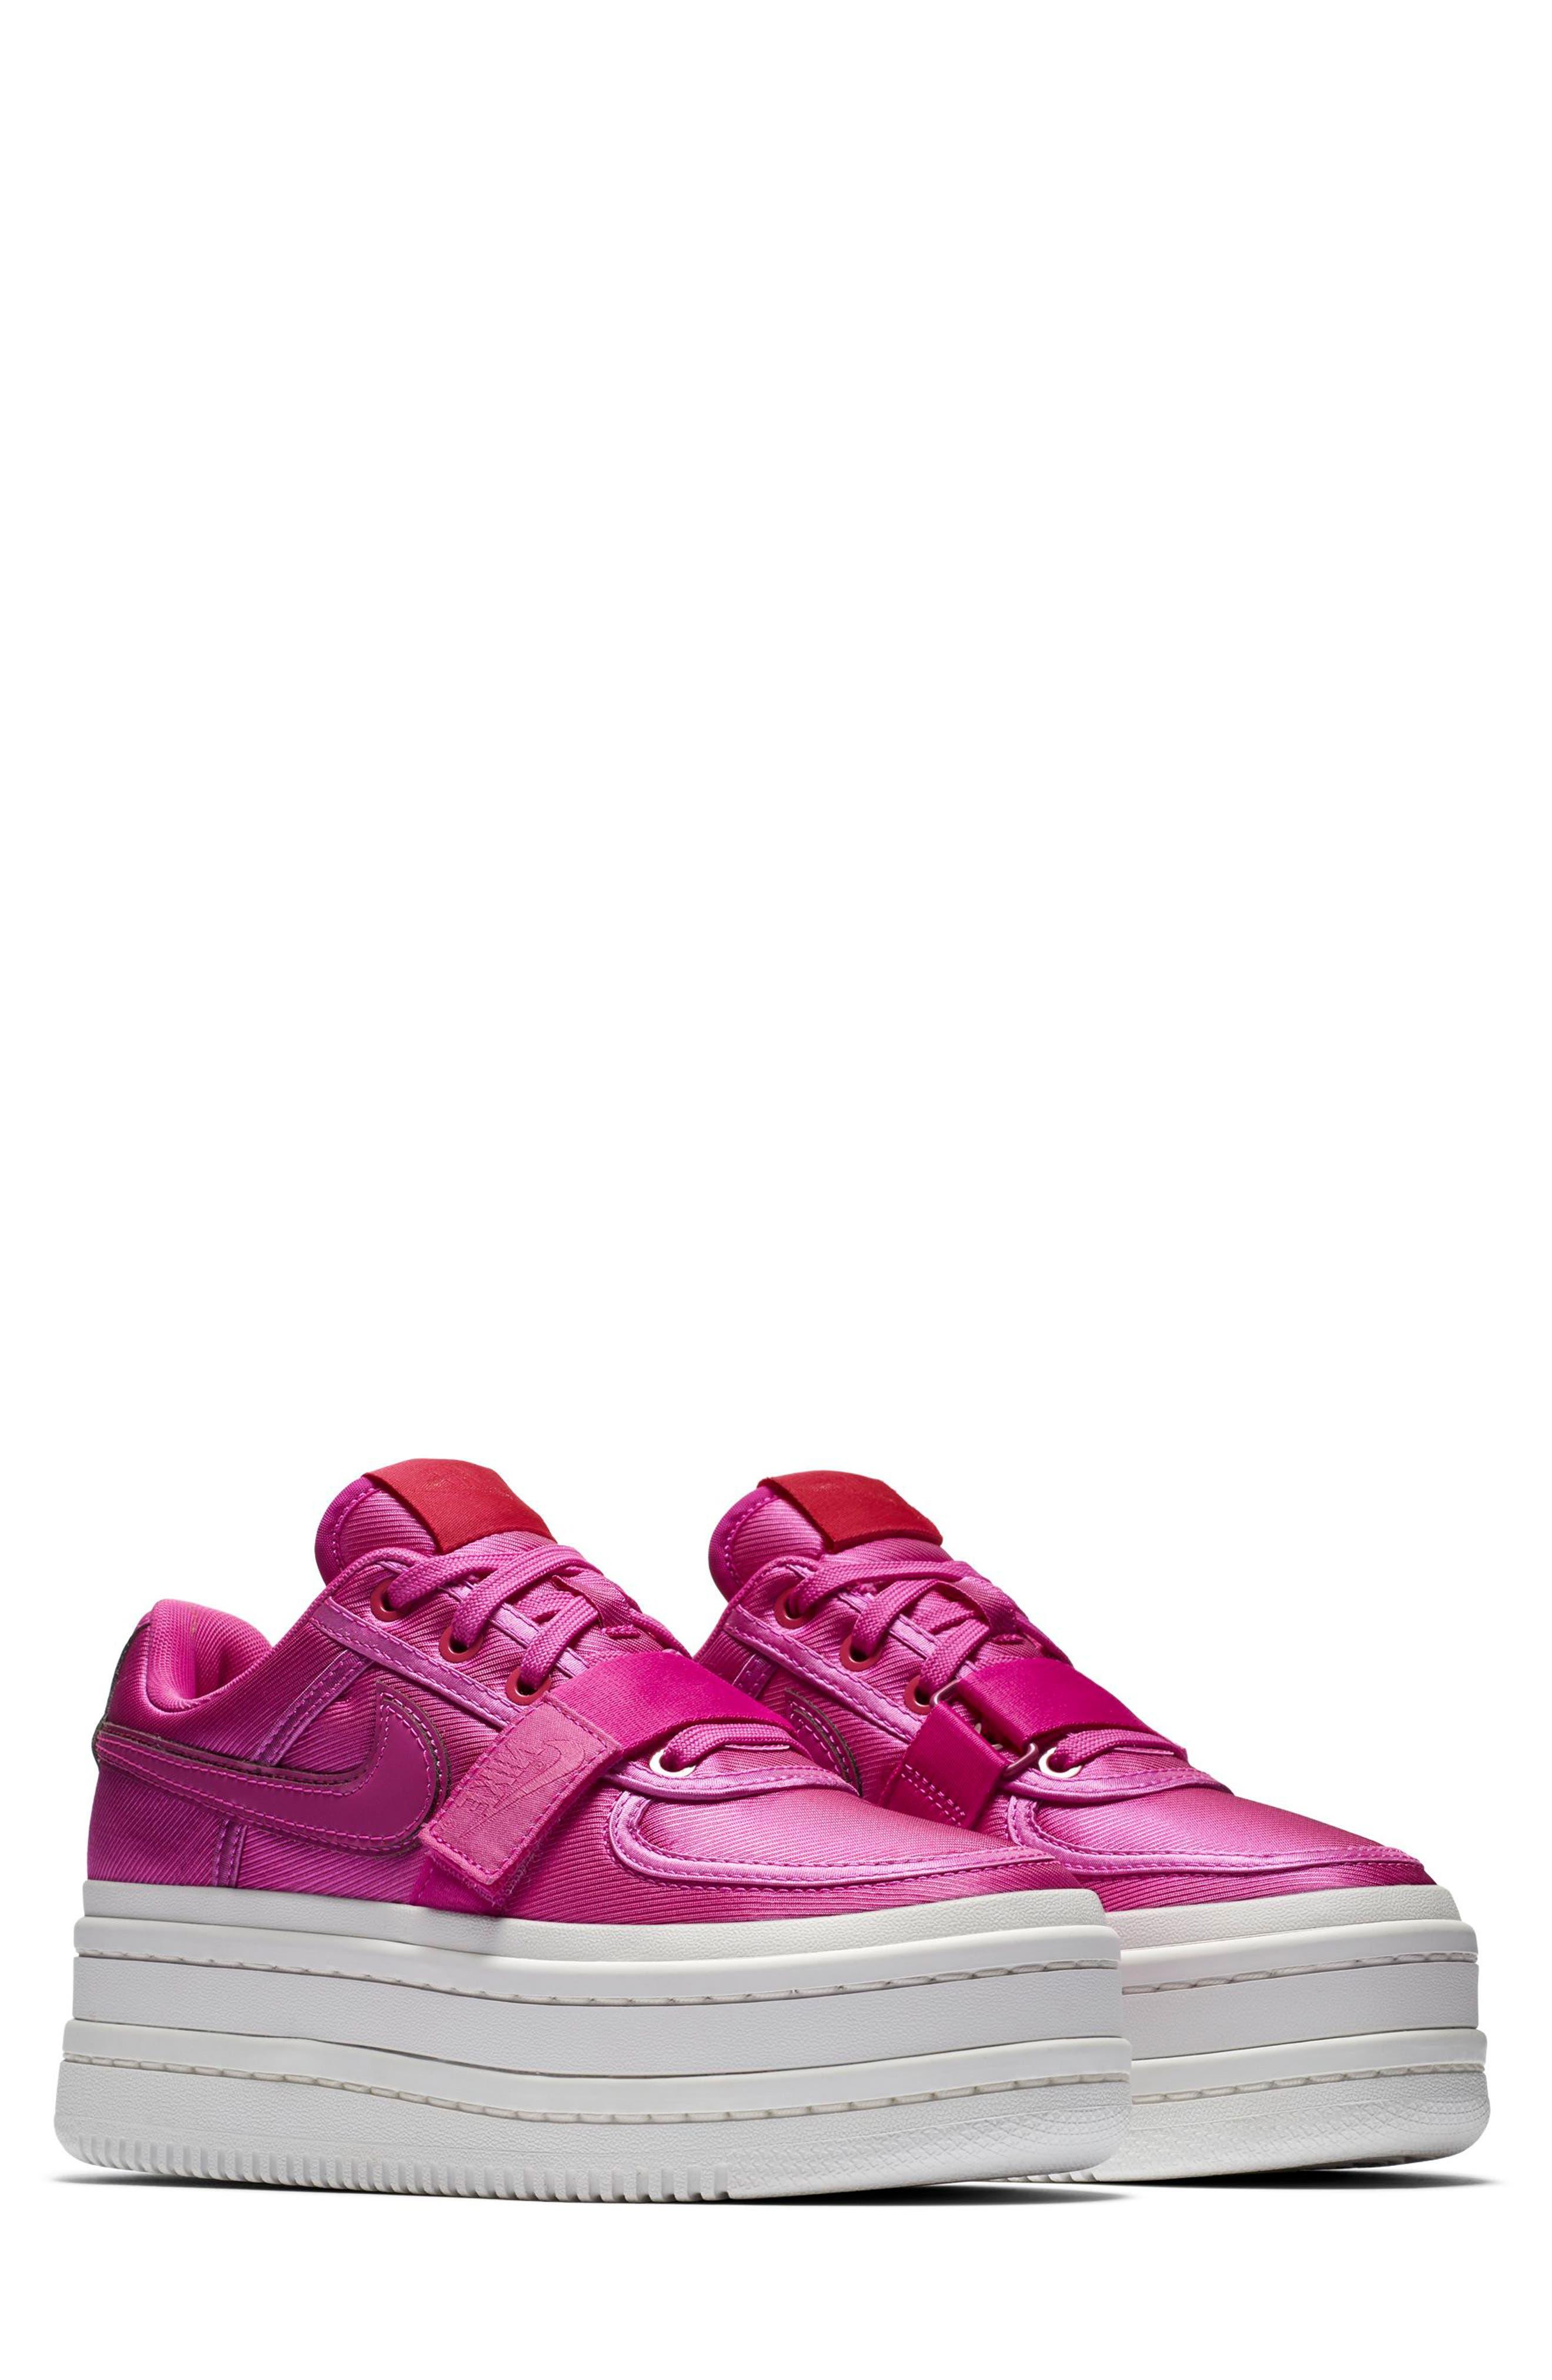 Vandal 2K Sneaker,                             Main thumbnail 1, color,                             HYPER MAGENTA/ SUMMIT/ FUCHSIA